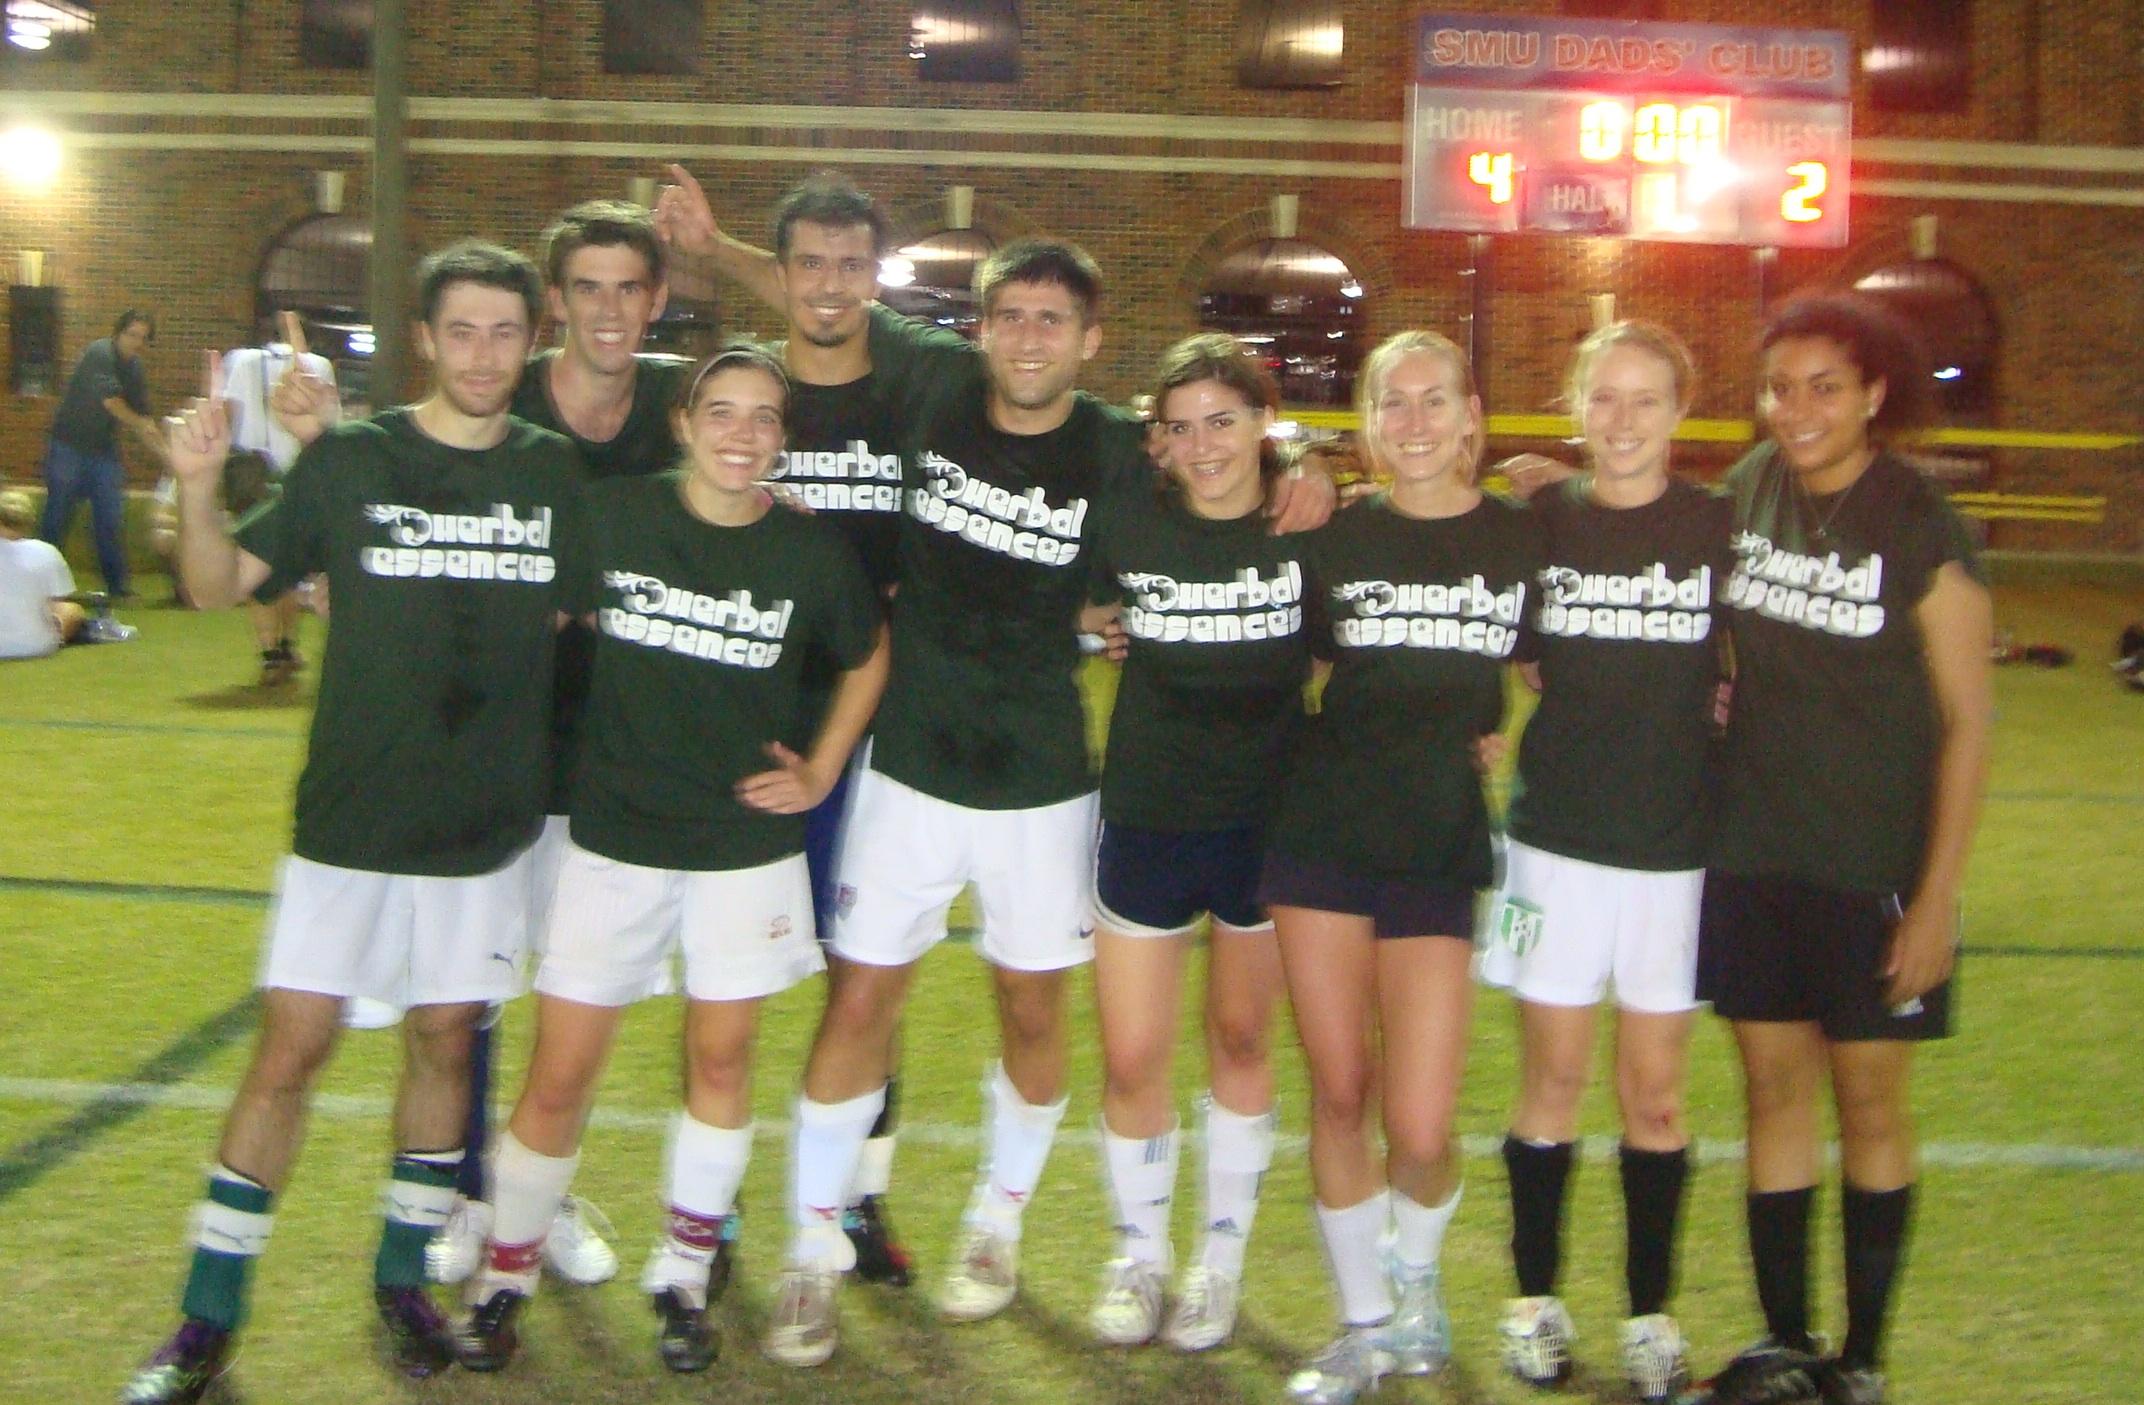 Design t shirt soccer - Intramural Soccer Champs T Shirt Photo